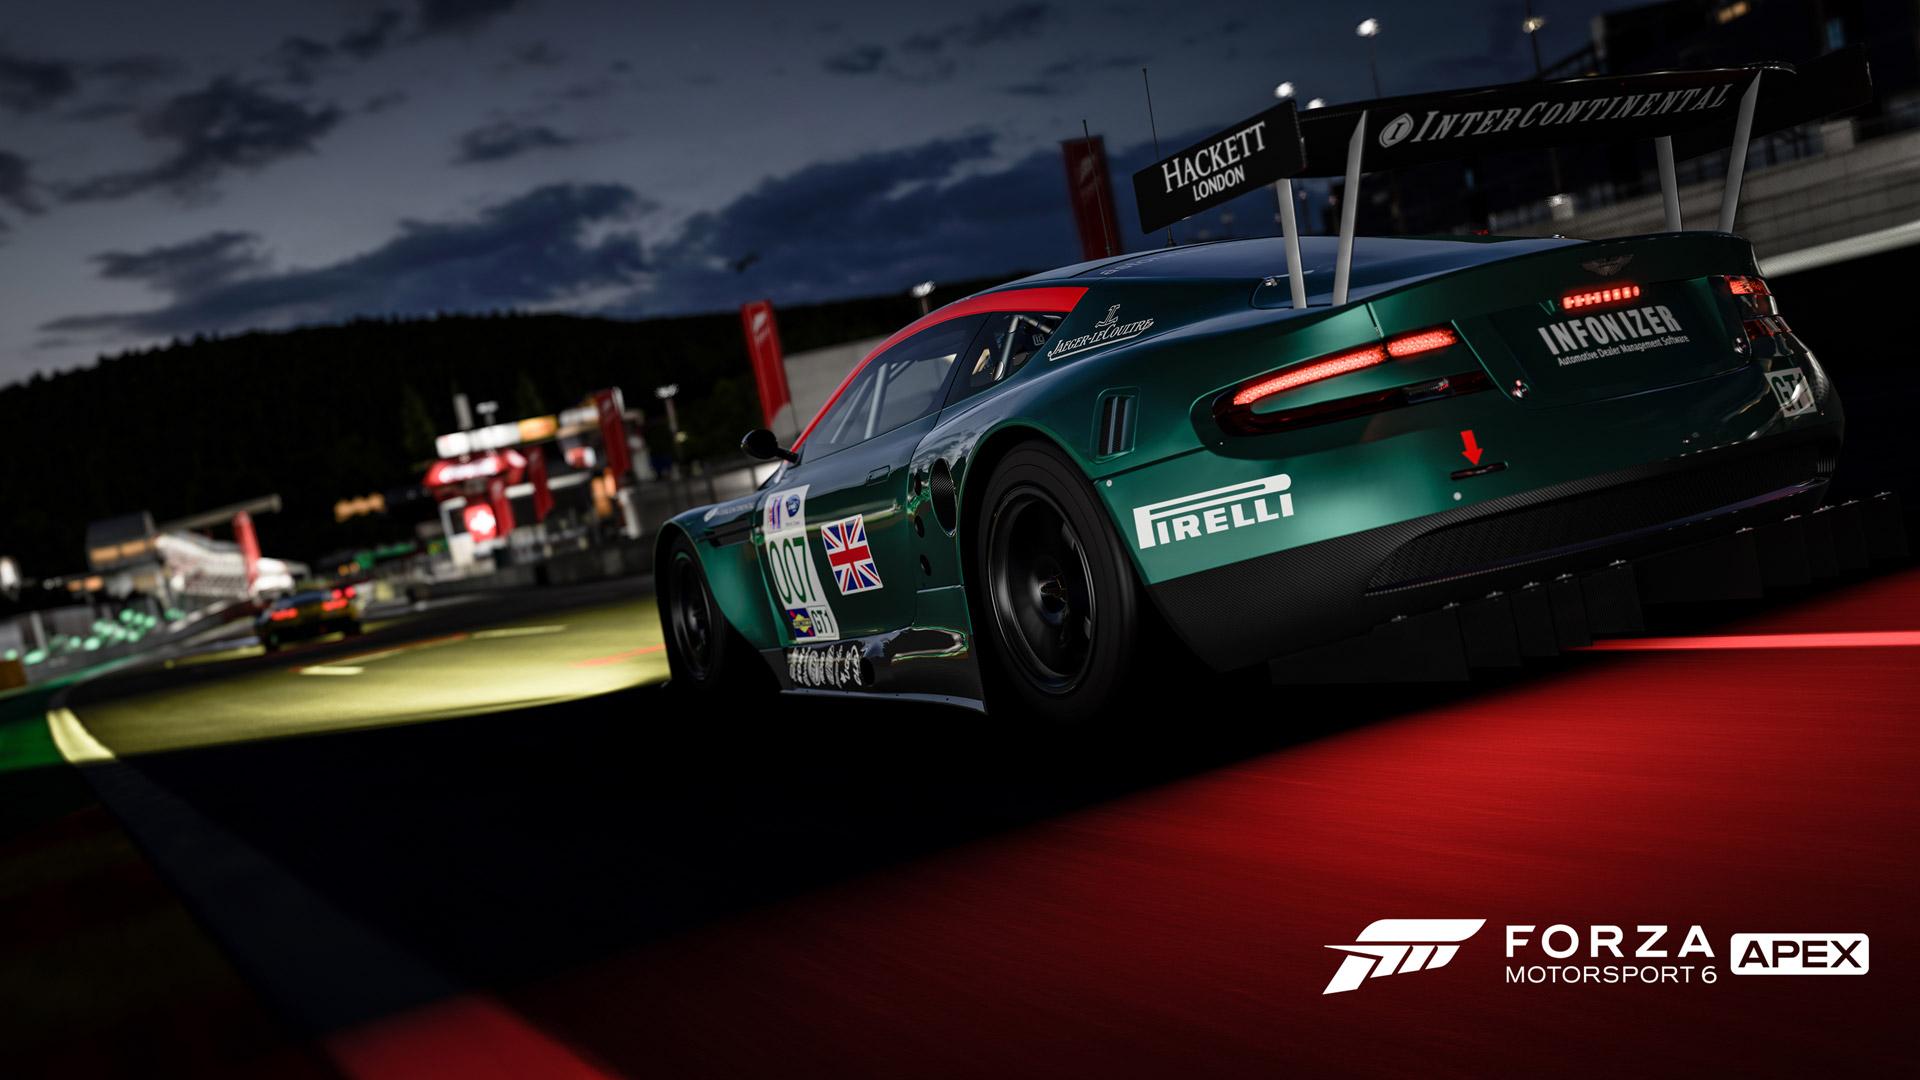 Free Forza Motorsport 6: Apex Wallpaper in 1920x1080